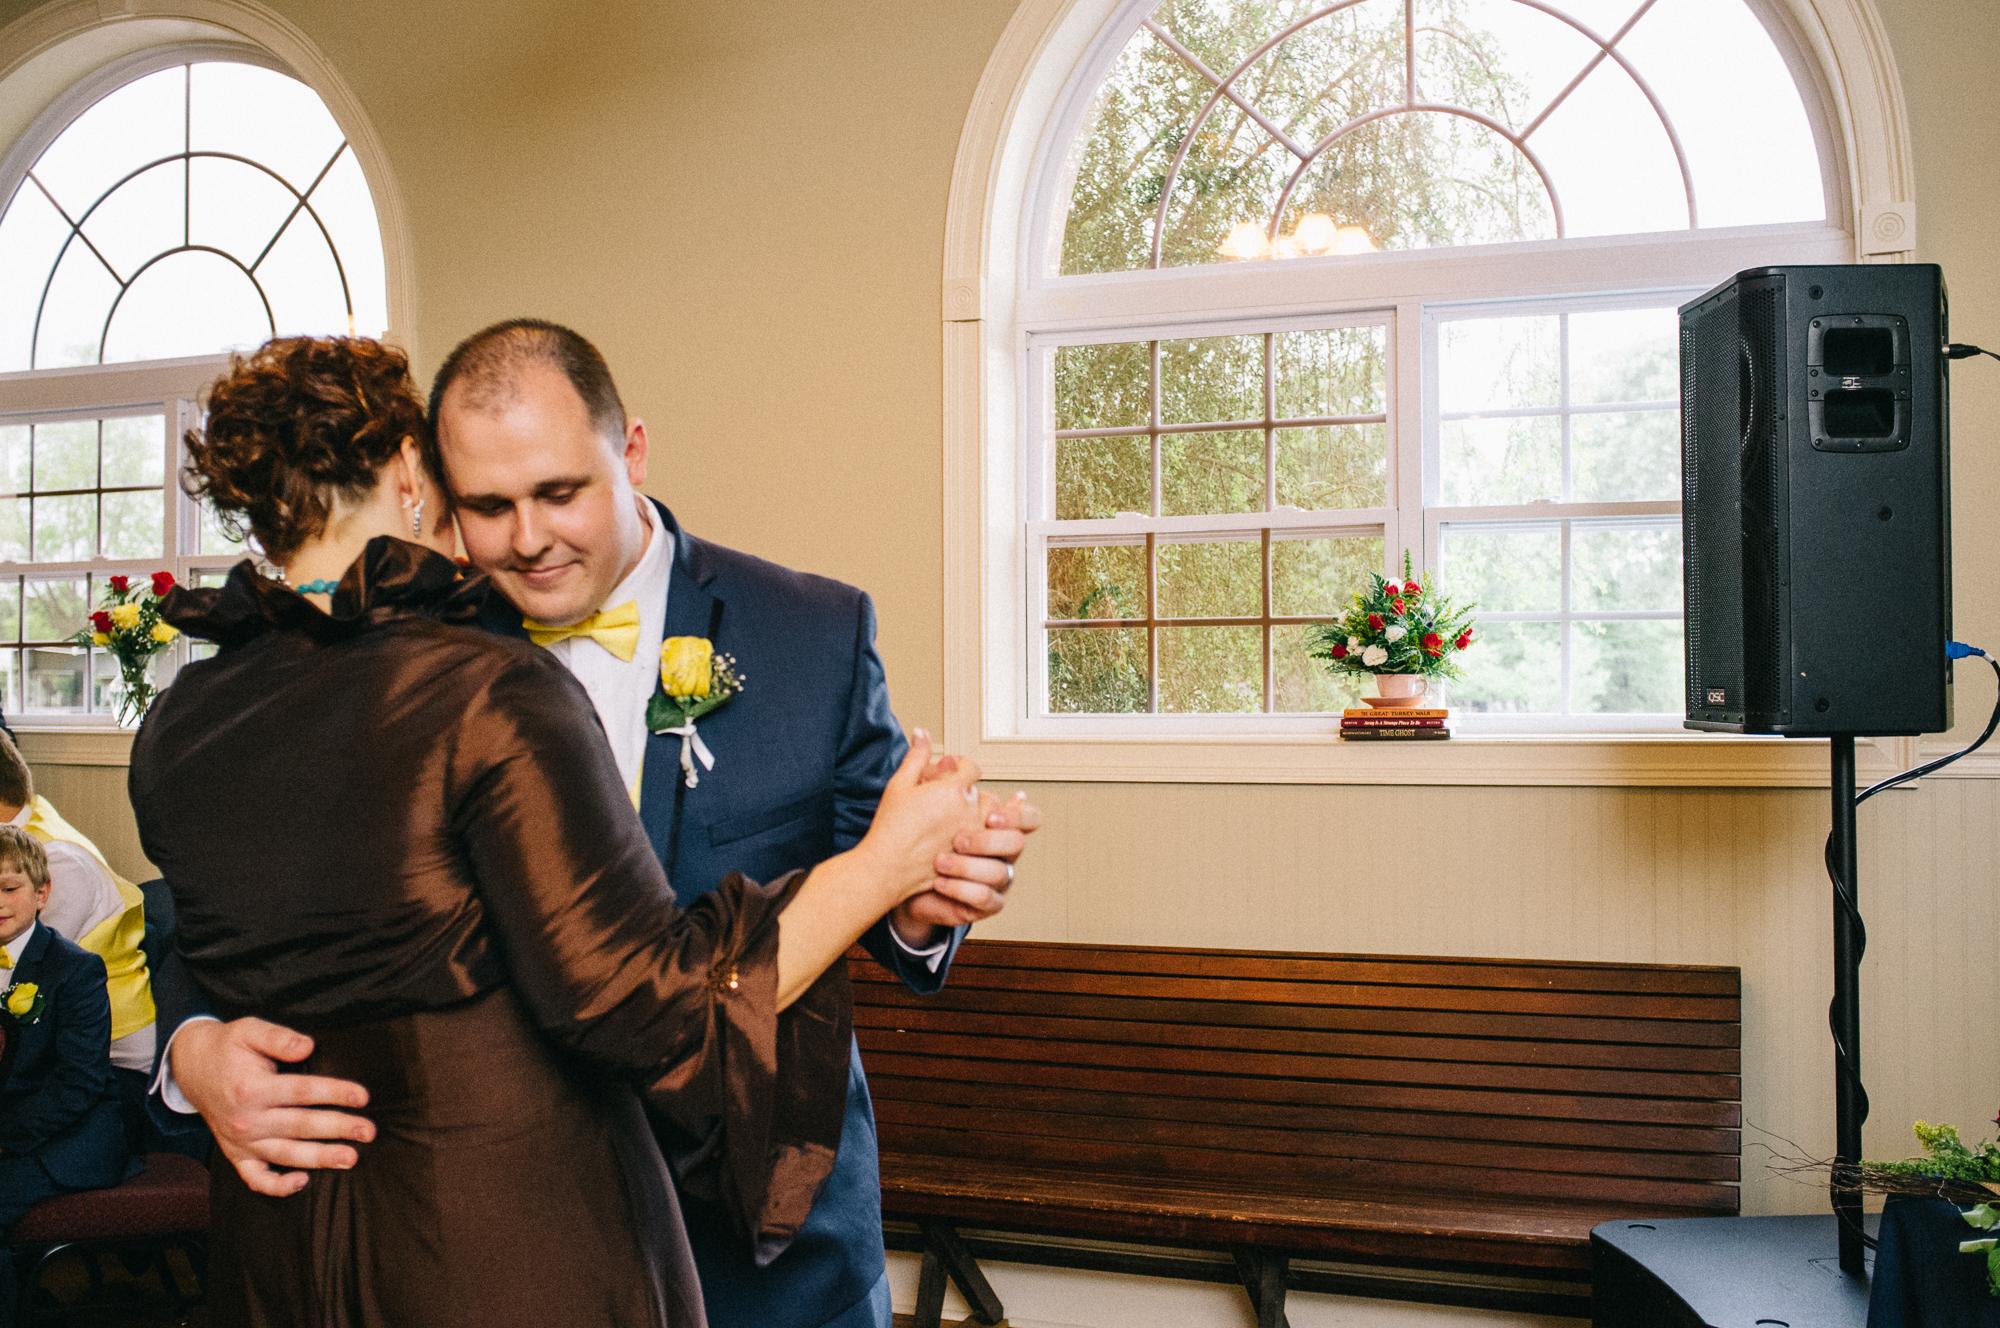 Emily-Shay-wedding-blog-28.jpg